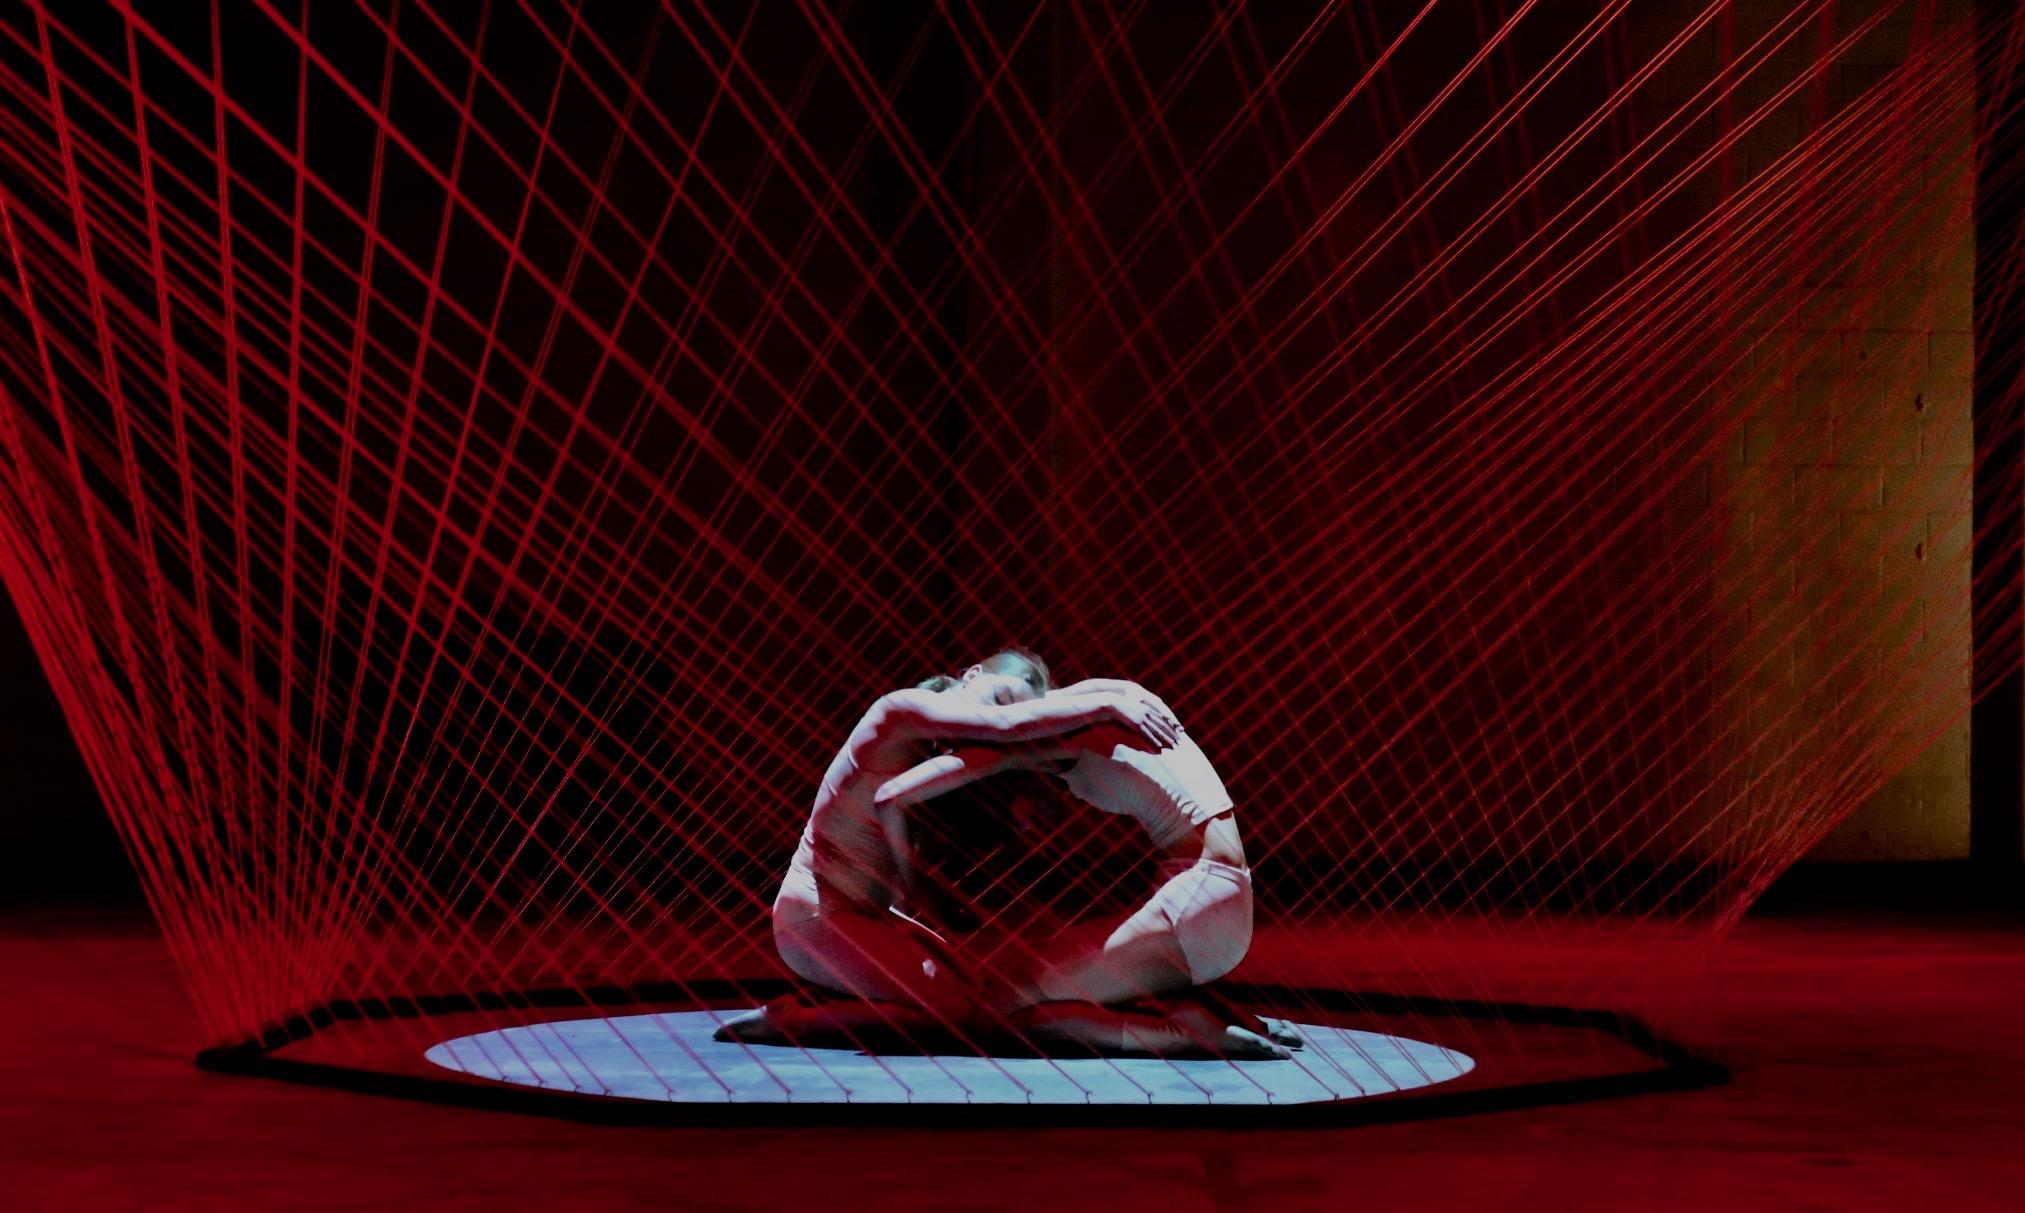 DAVID FLORES' string sculpture